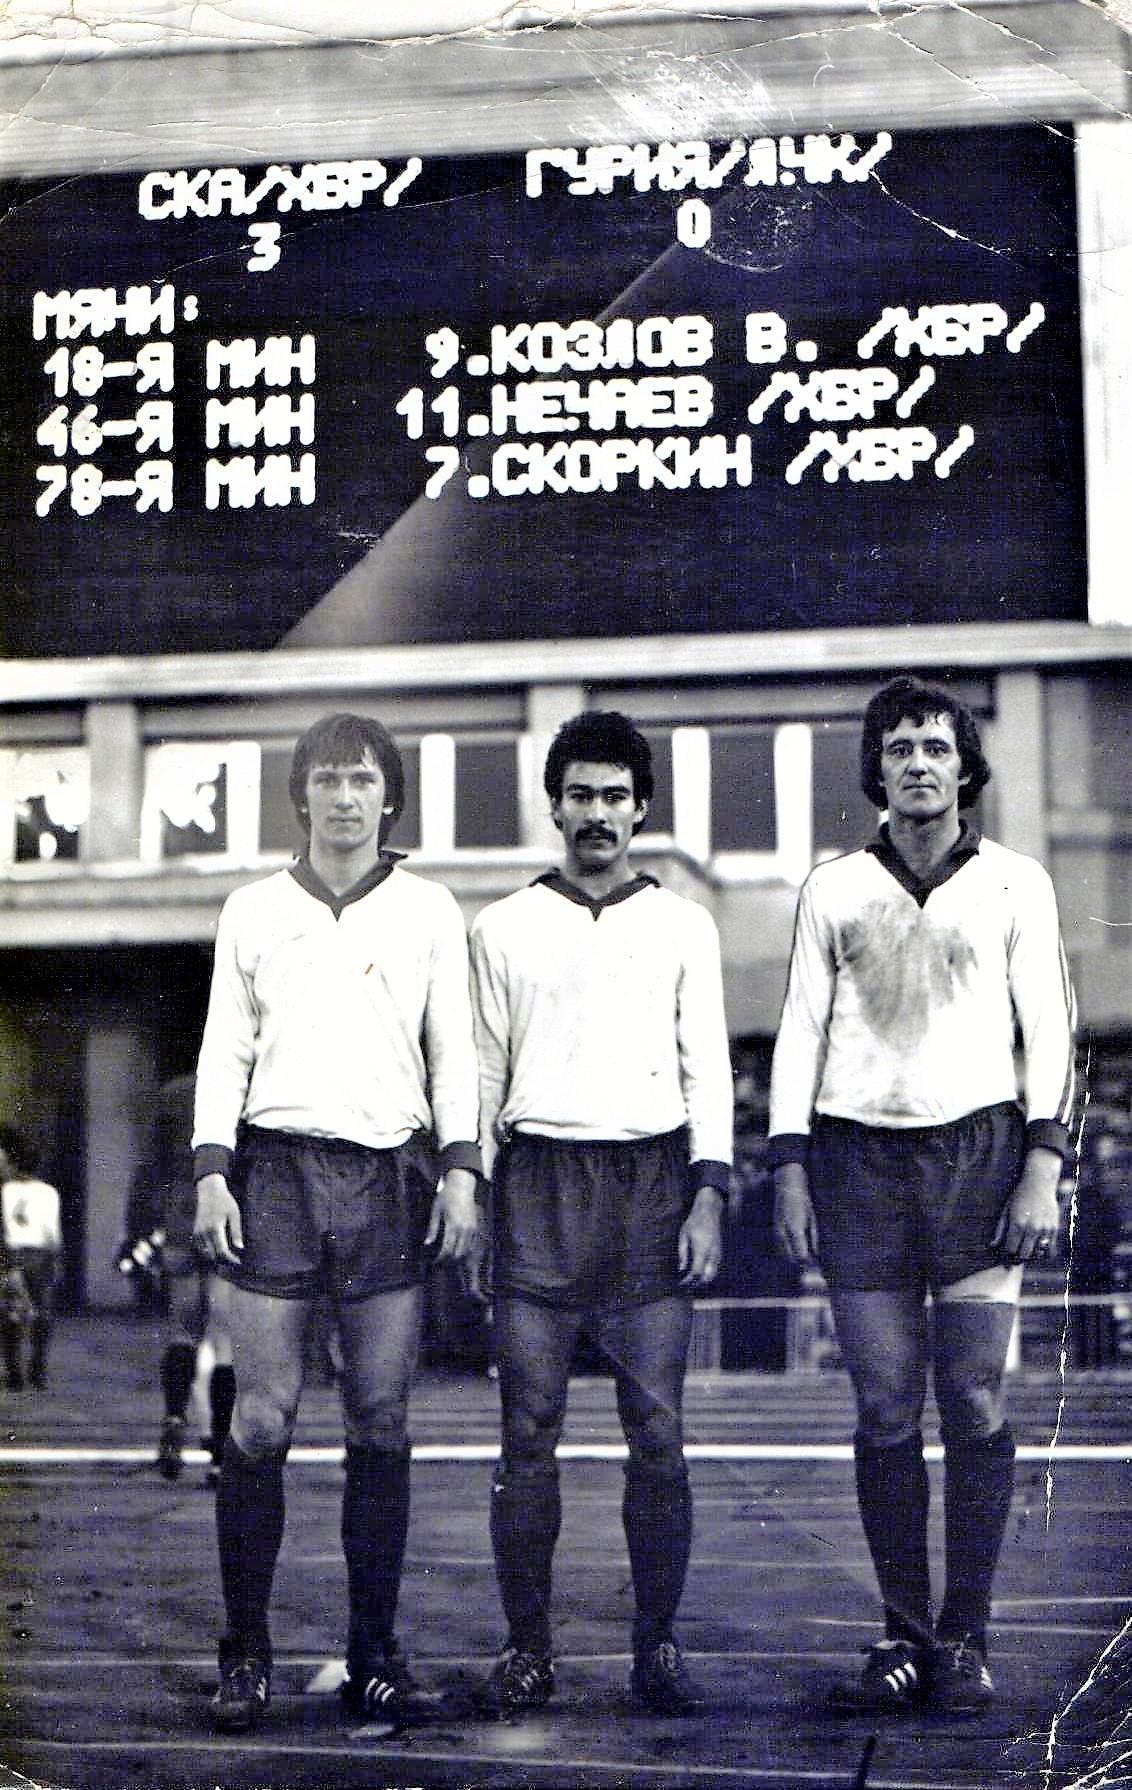 Три армейских «мушкетёра» - Олег Скоркин, Сергей Нечаев, Владимир Козлов. Год 1983-й